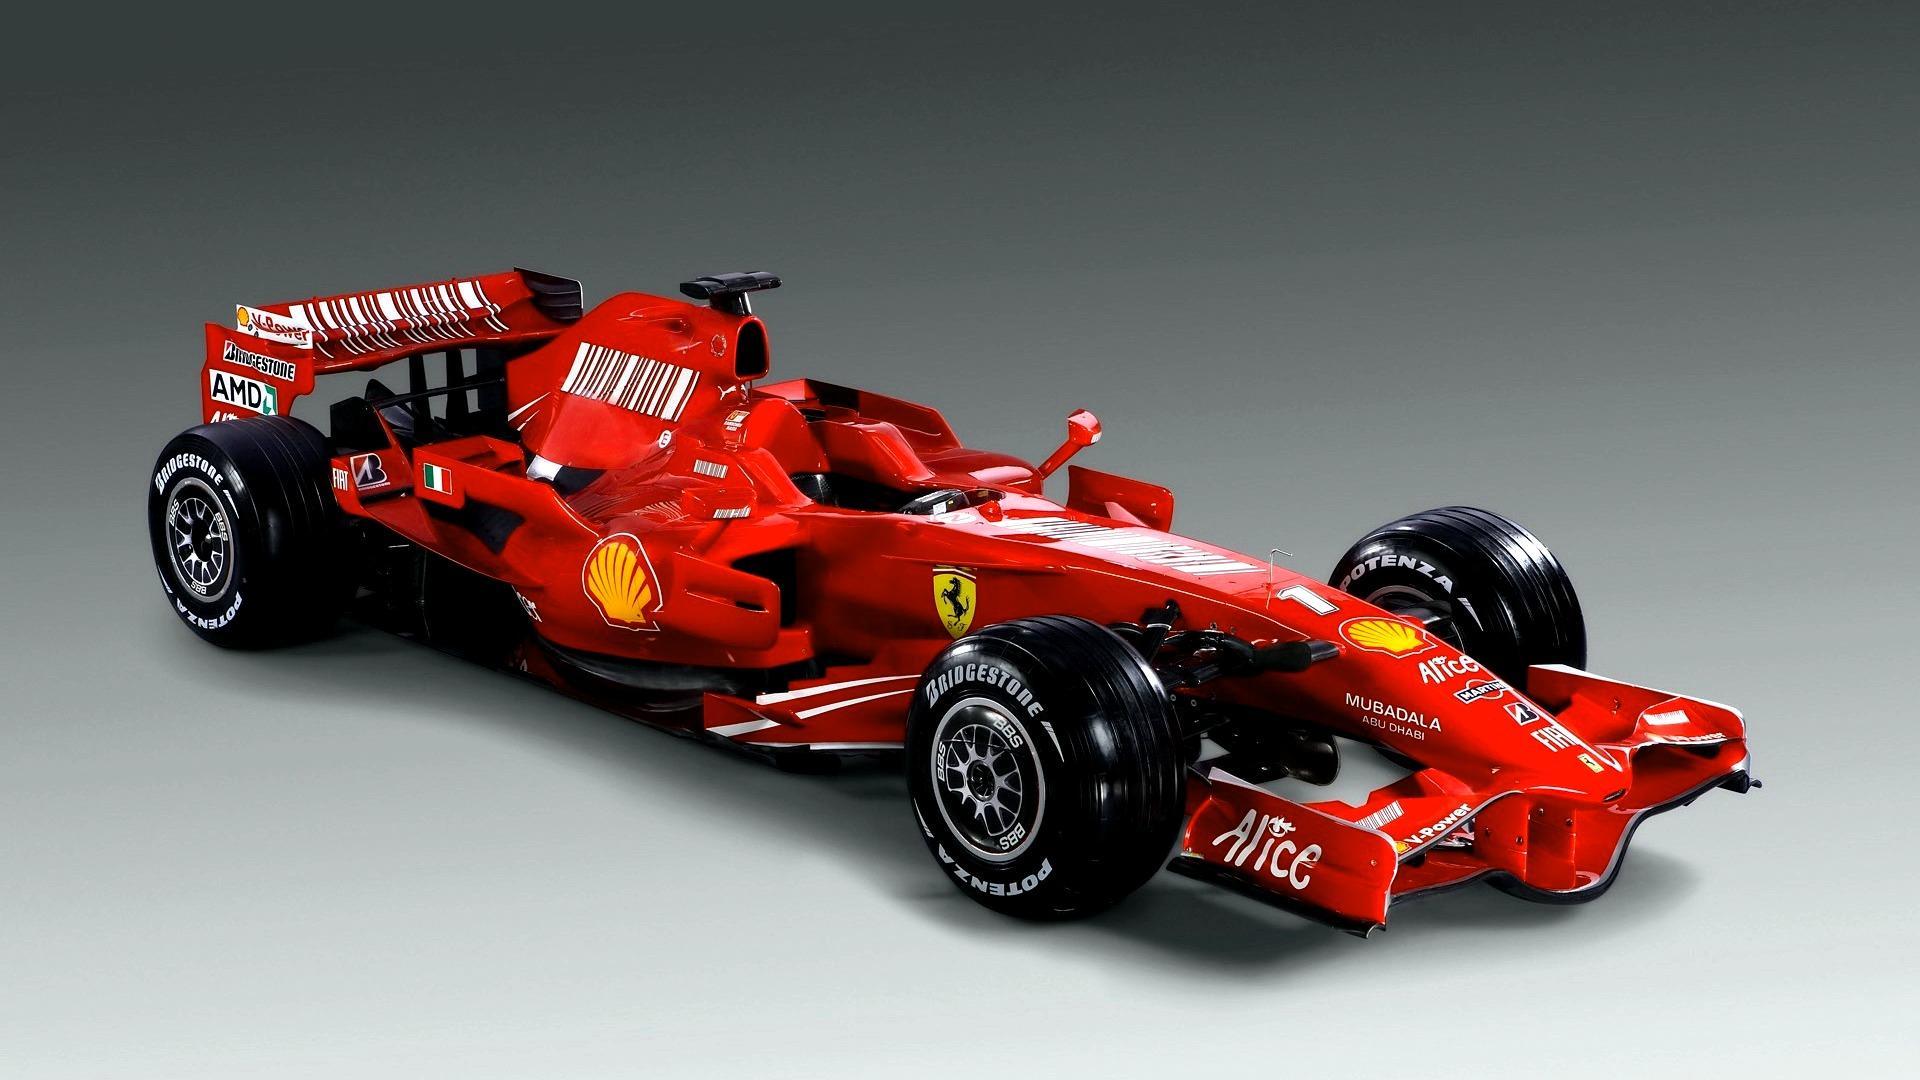 F1 smartphone wallpaper 10